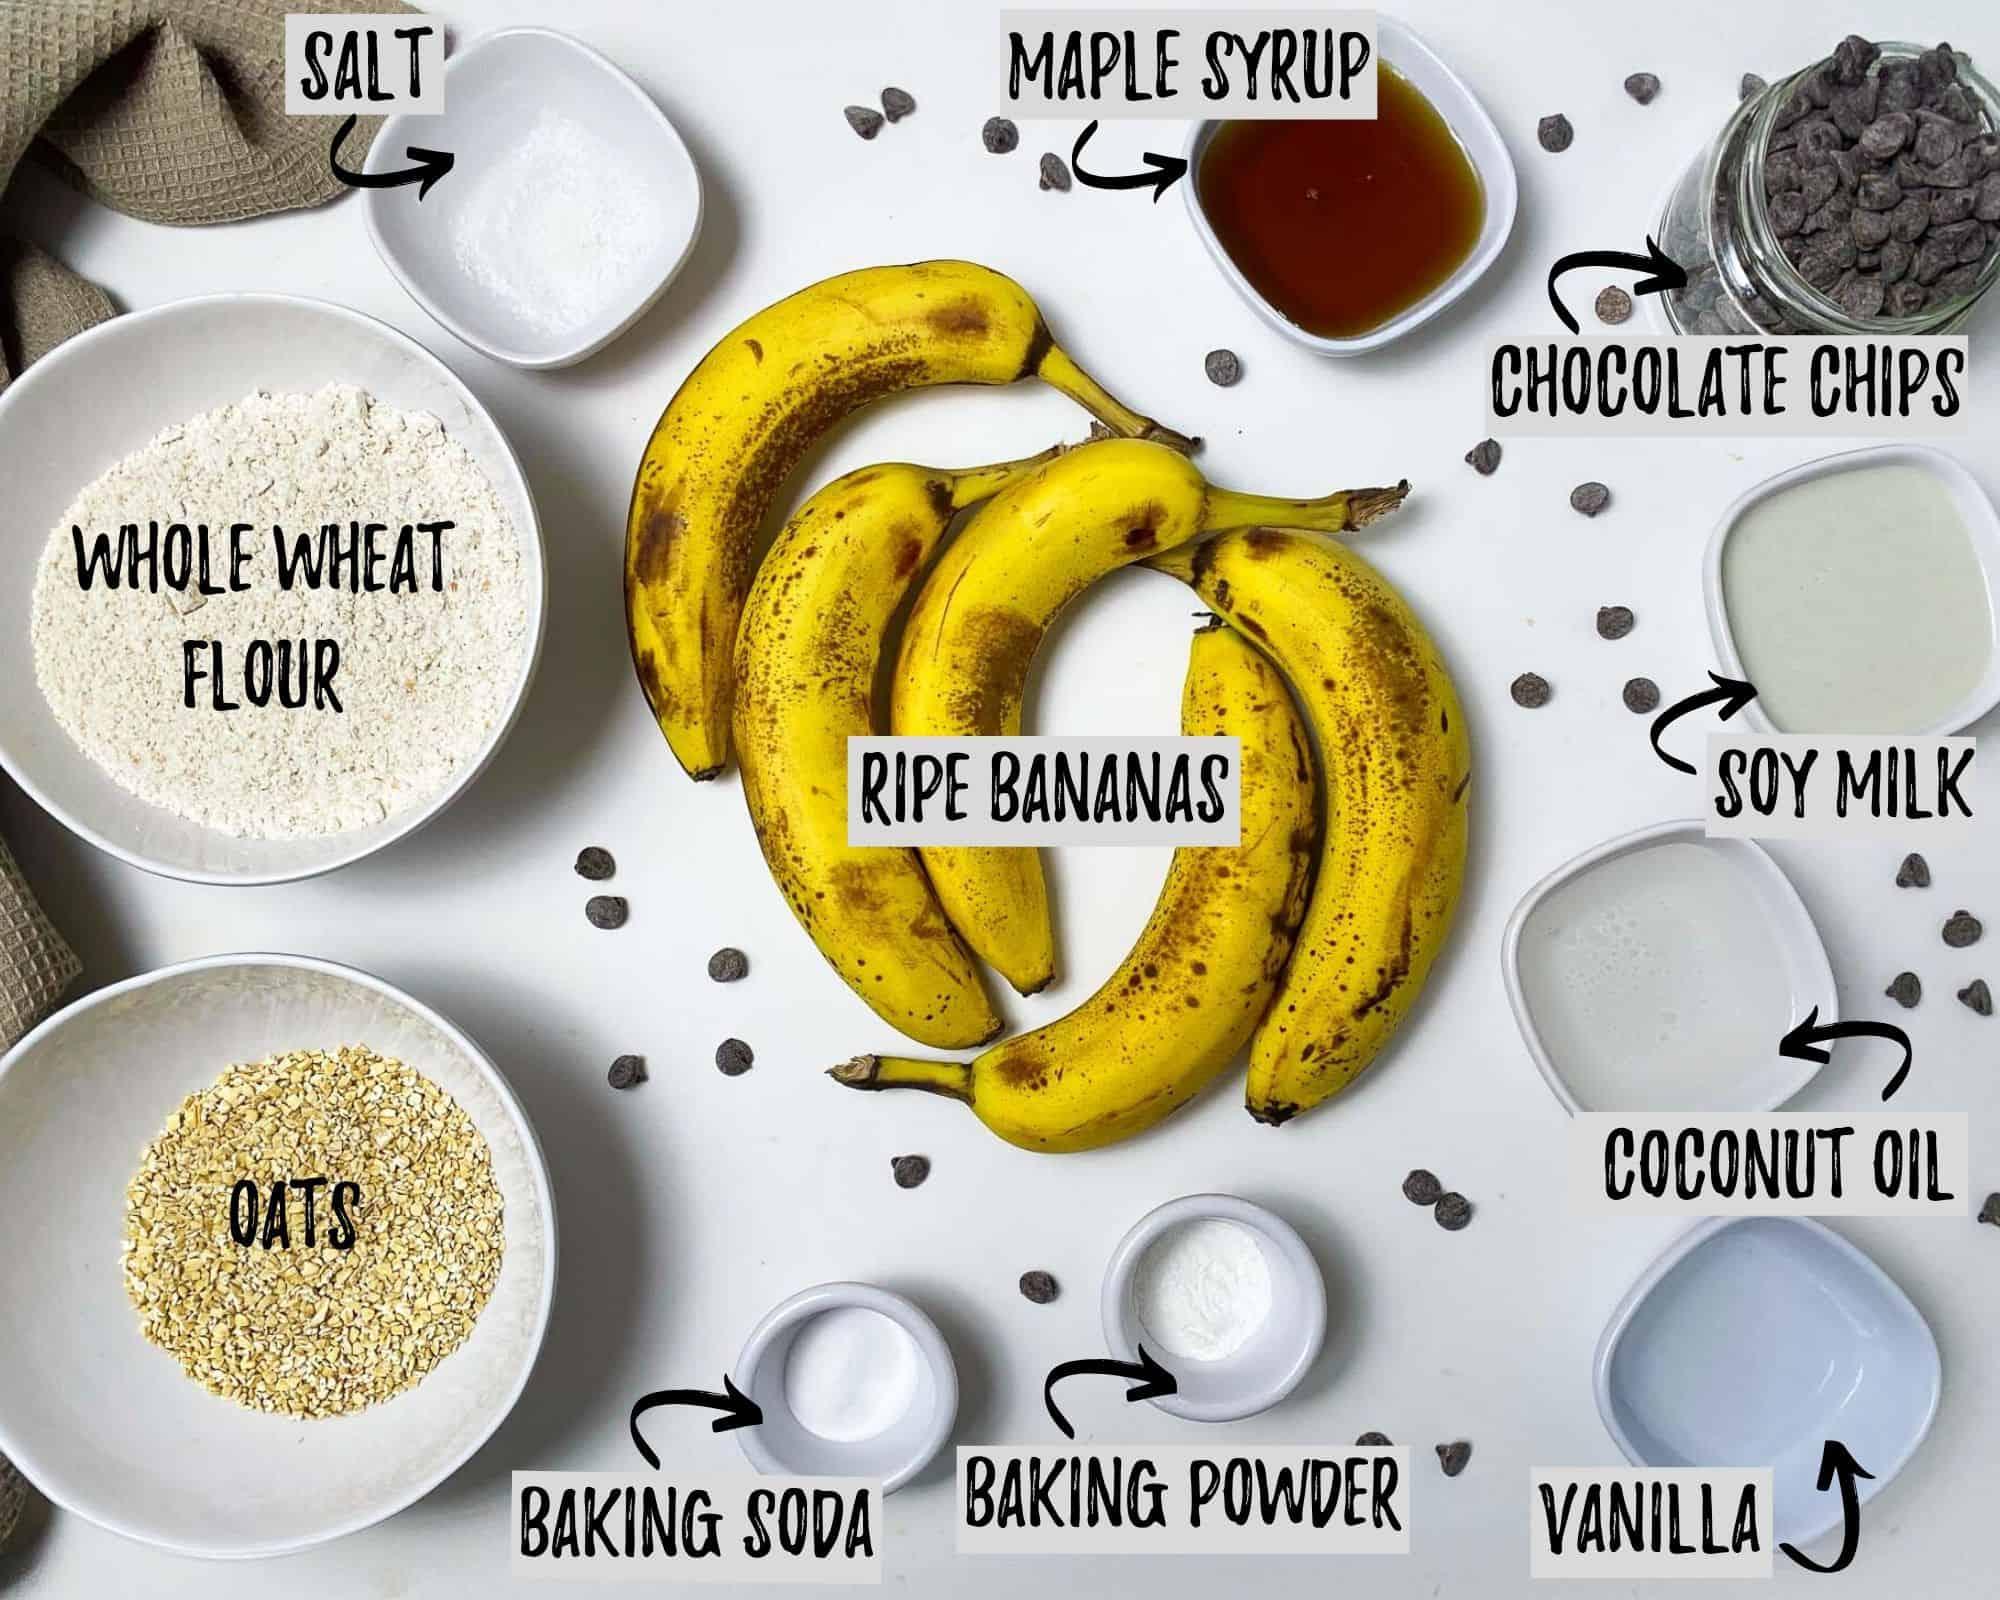 bananas, bowl of flour, bowl of oats, baking powder, baking soda, maple syrup, vanilla, milk, oil, salt